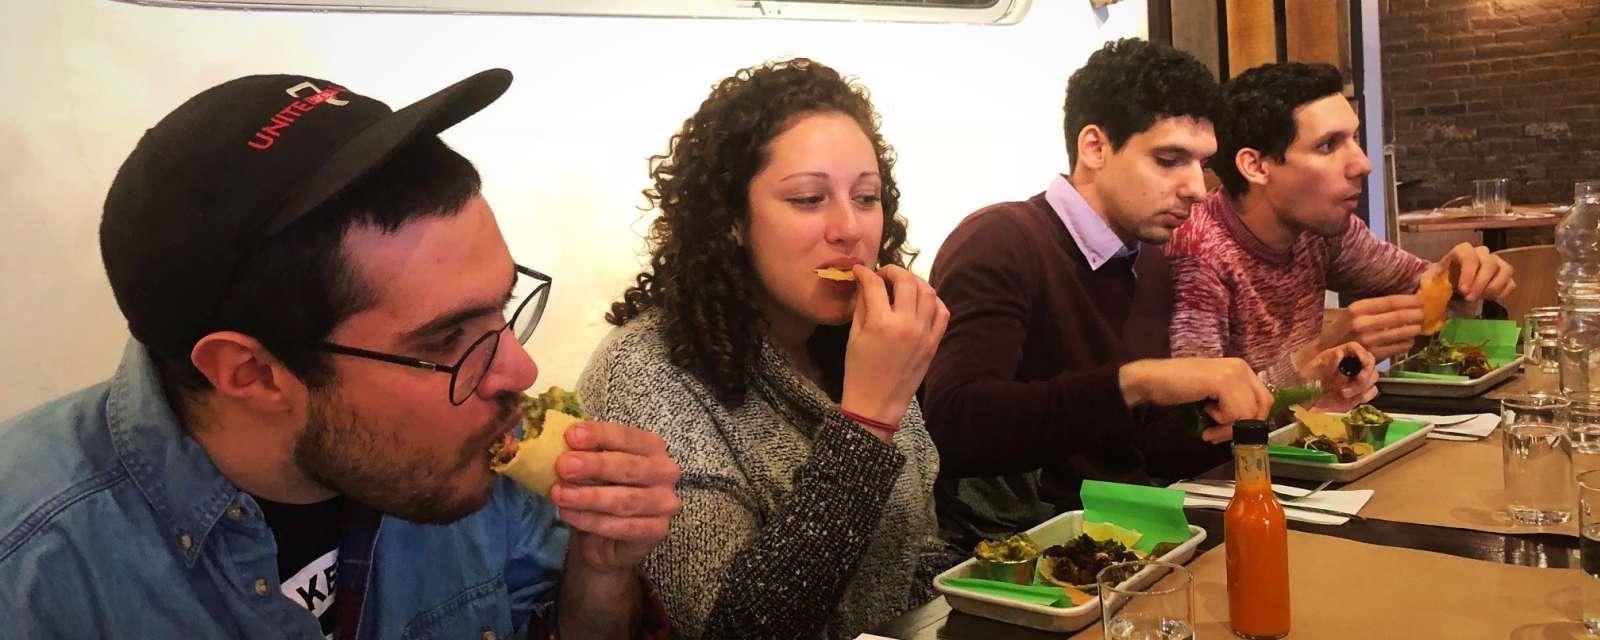 Ama cocina group dining